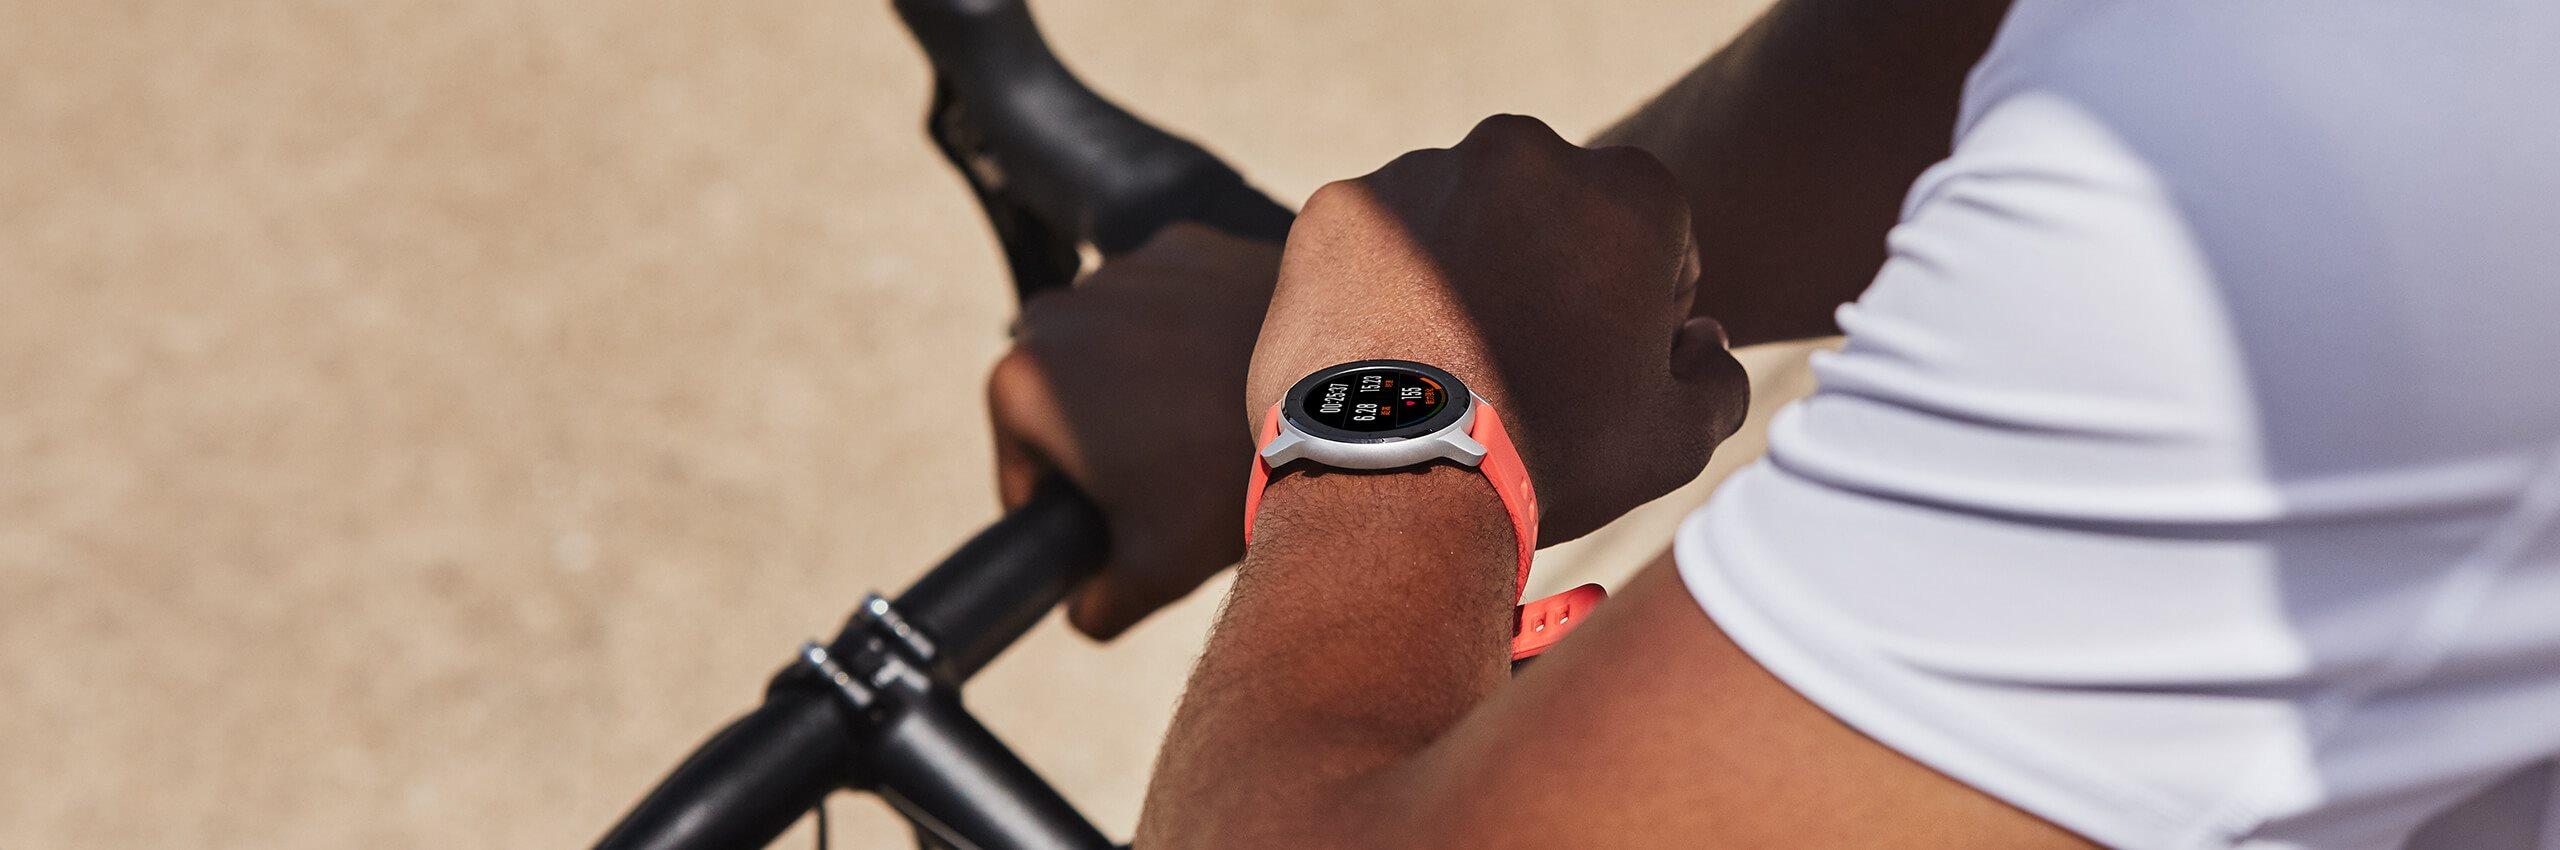 xiaomi; chytré hodinky; smartwatch; huami; wearables